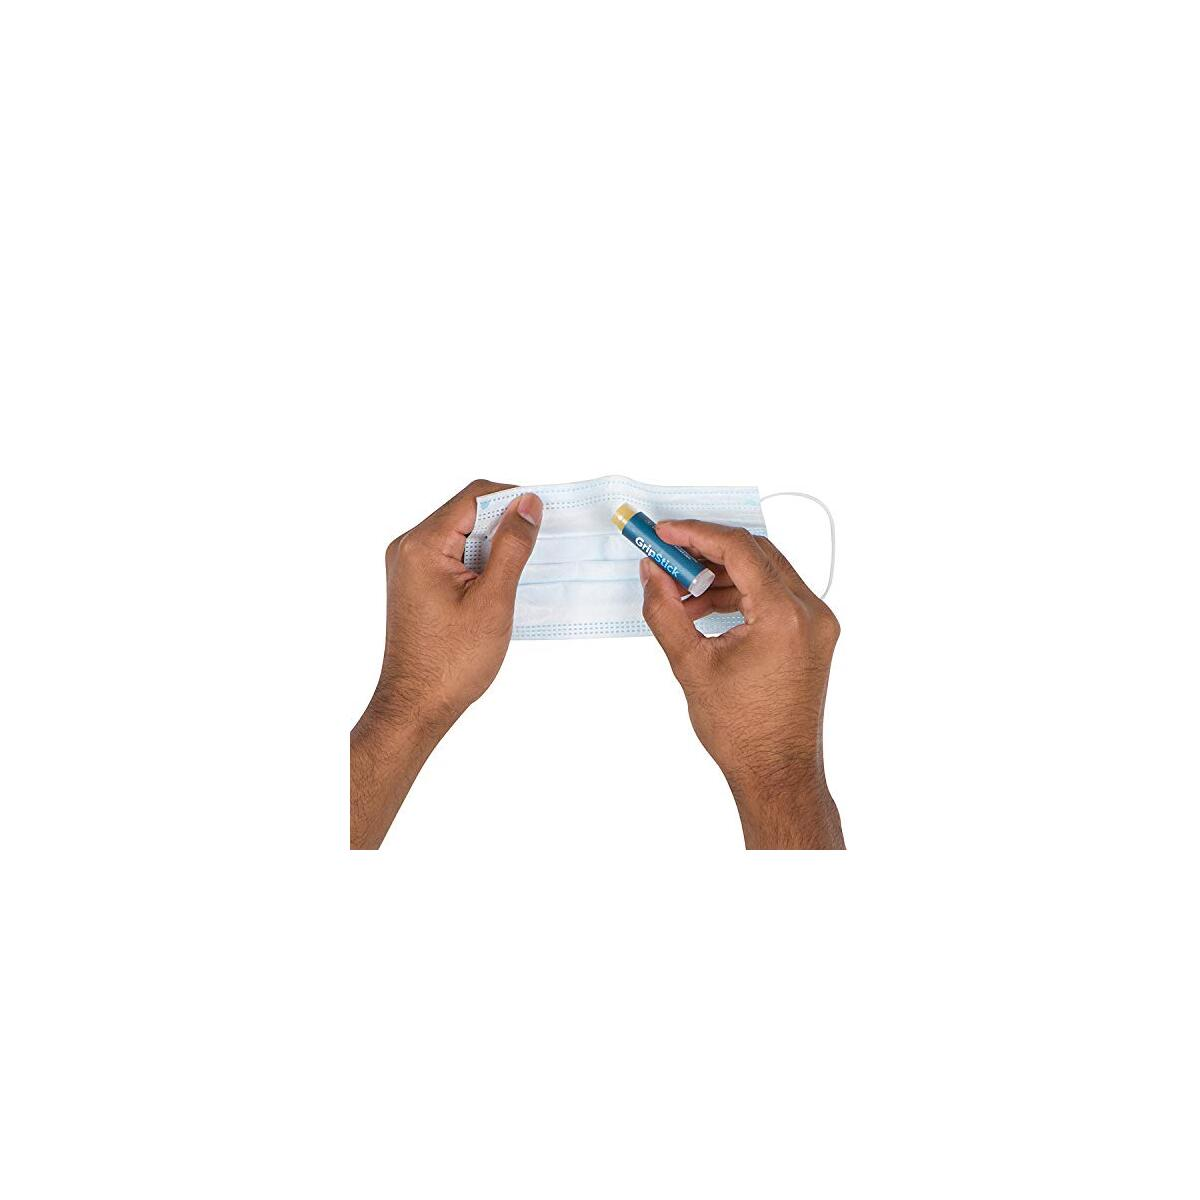 GripStick - Anti Slip Grip for Face Covering - Anti Fog Glasses Solution for Face Cover